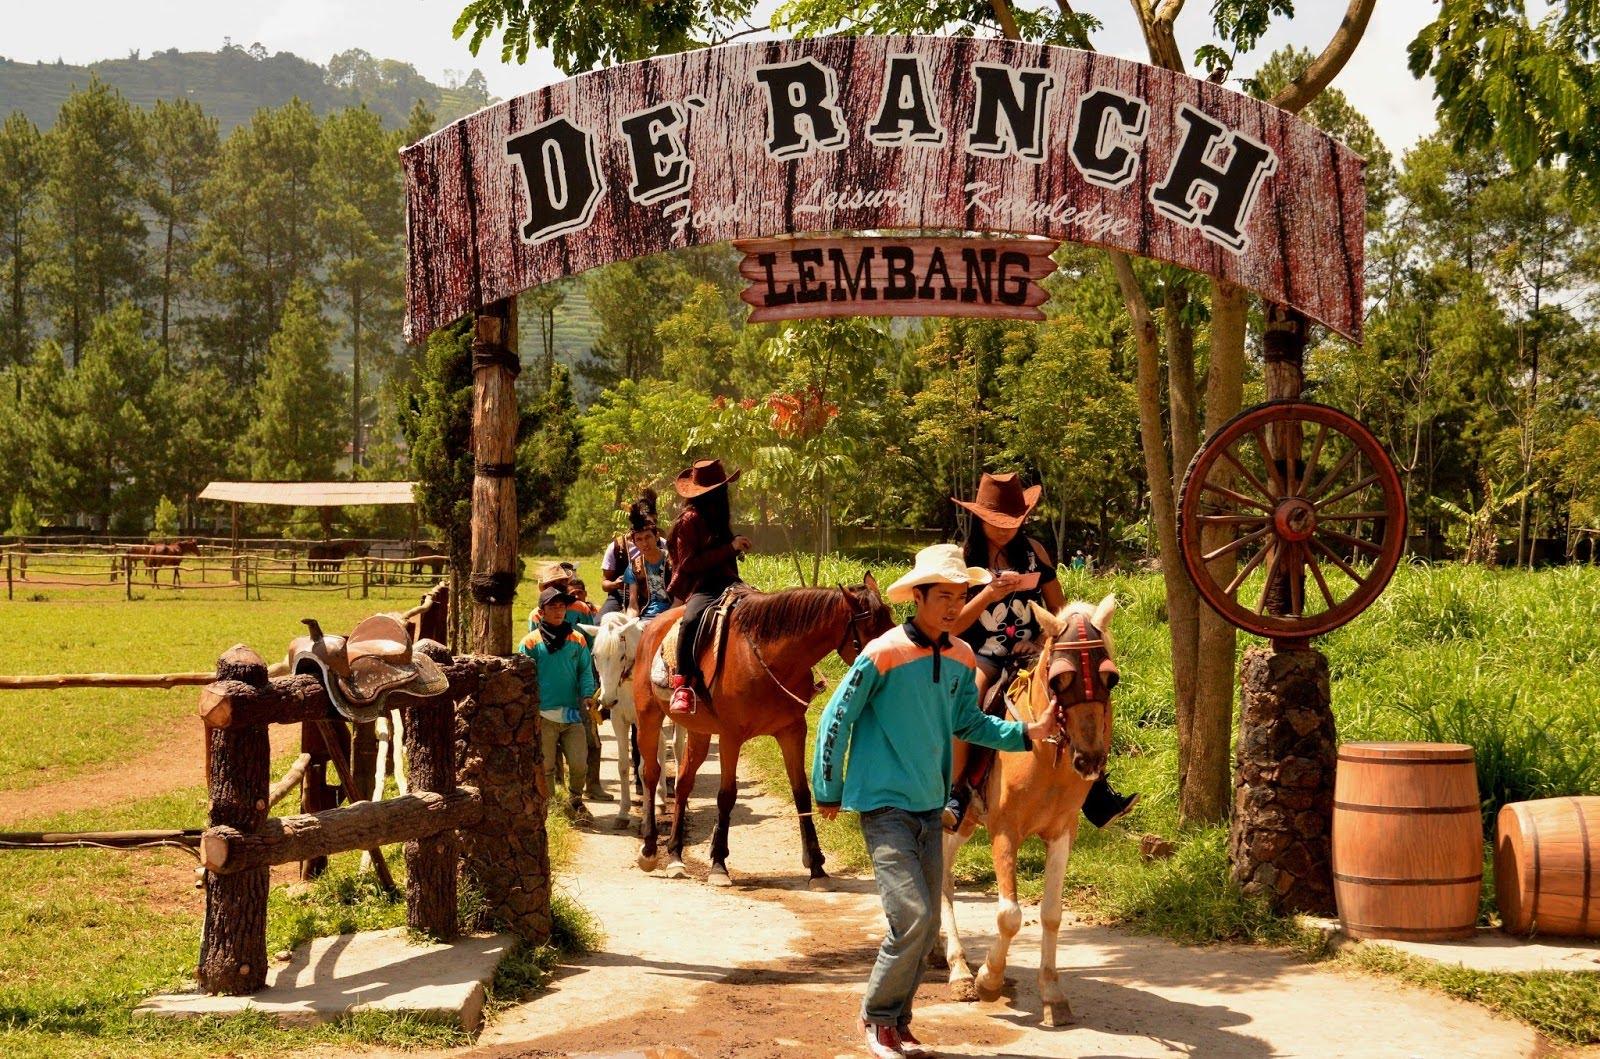 De Ranch Lembang - Tempat Wisata di Bandung yang Buka Saat Lebaran